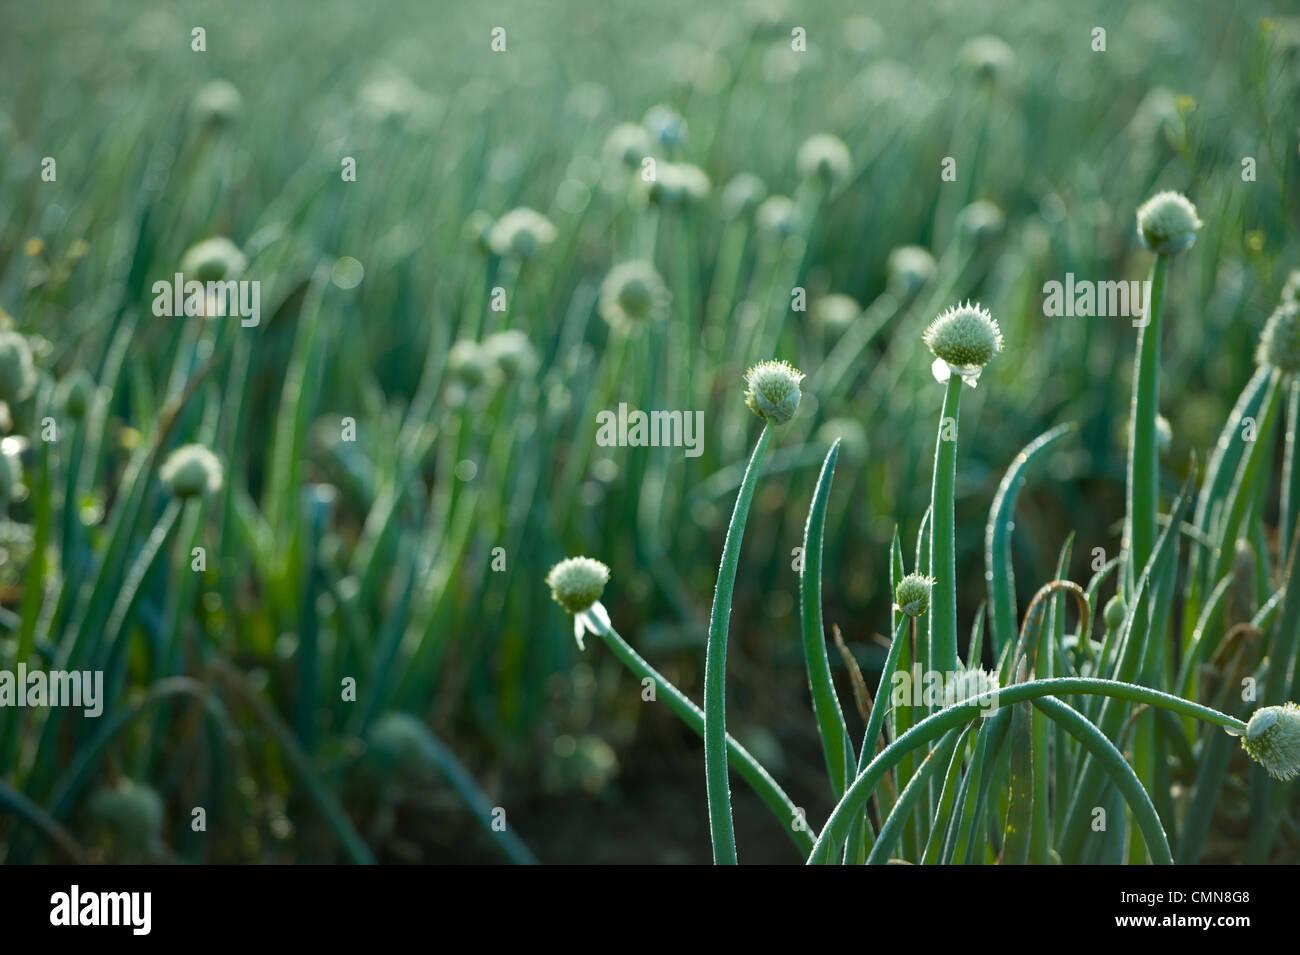 Onions growing in field Stock Photo